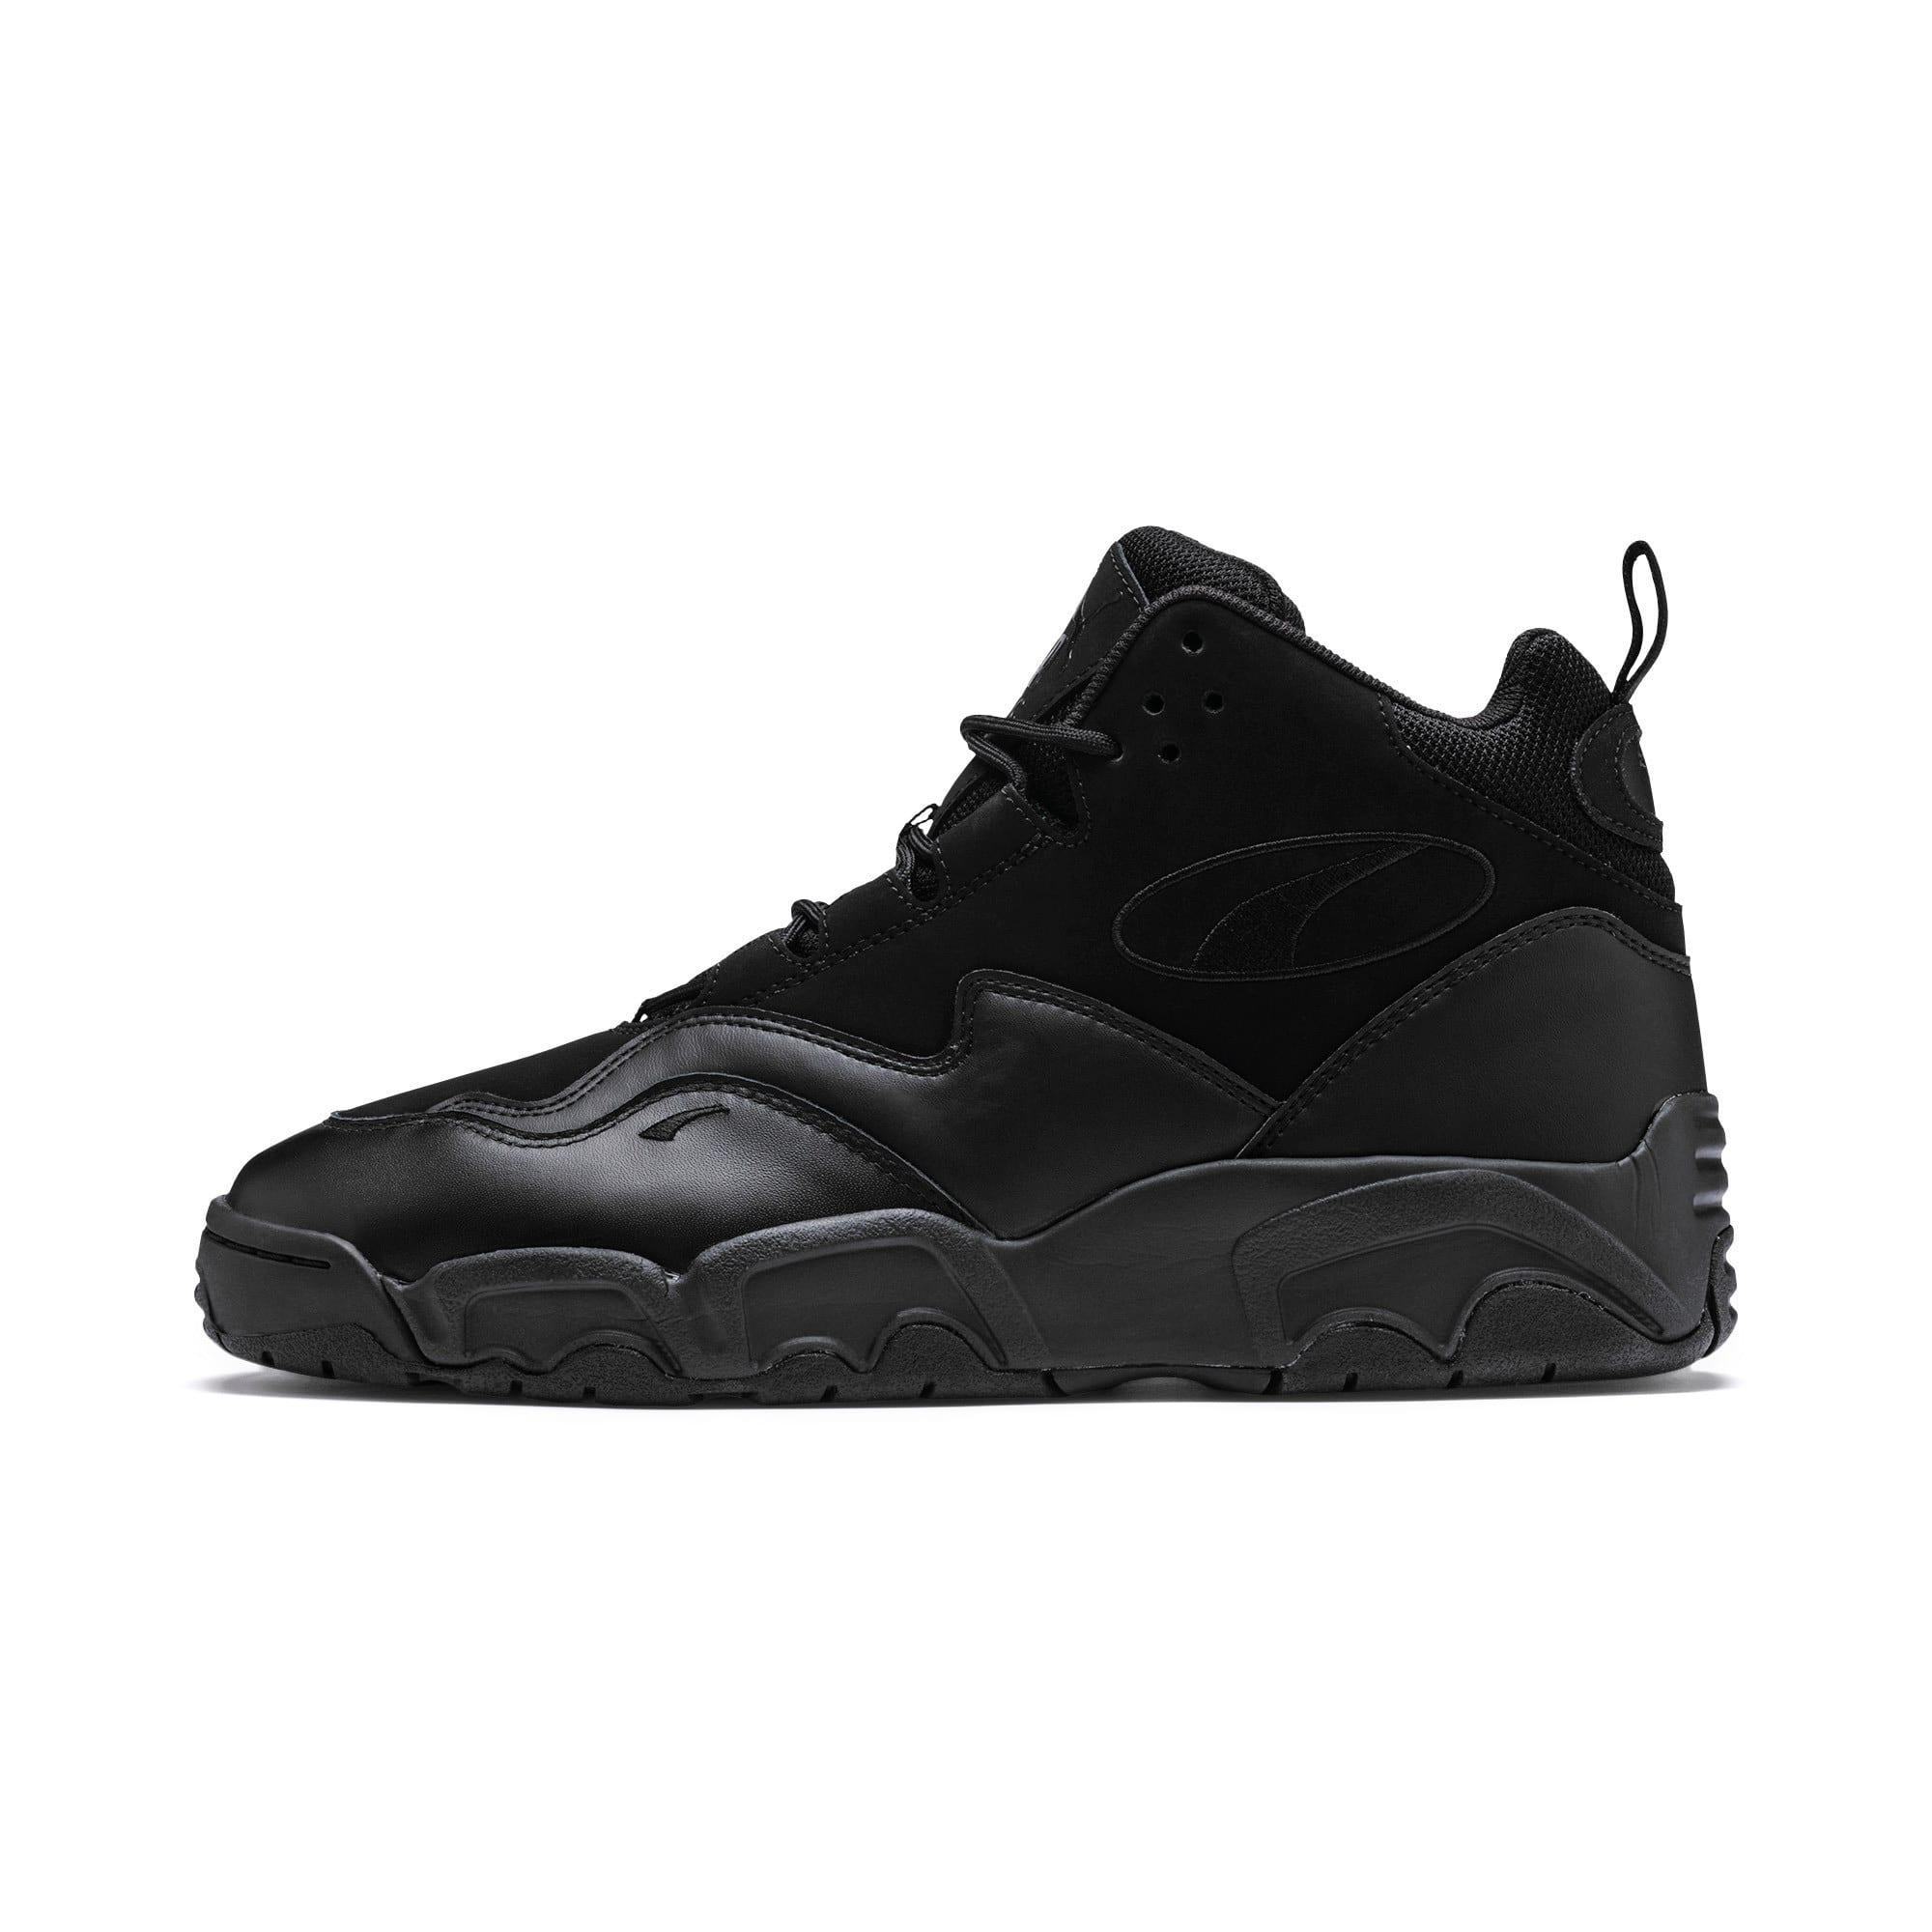 Thumbnail 1 of Source Mid Sneakers, Puma Black, medium